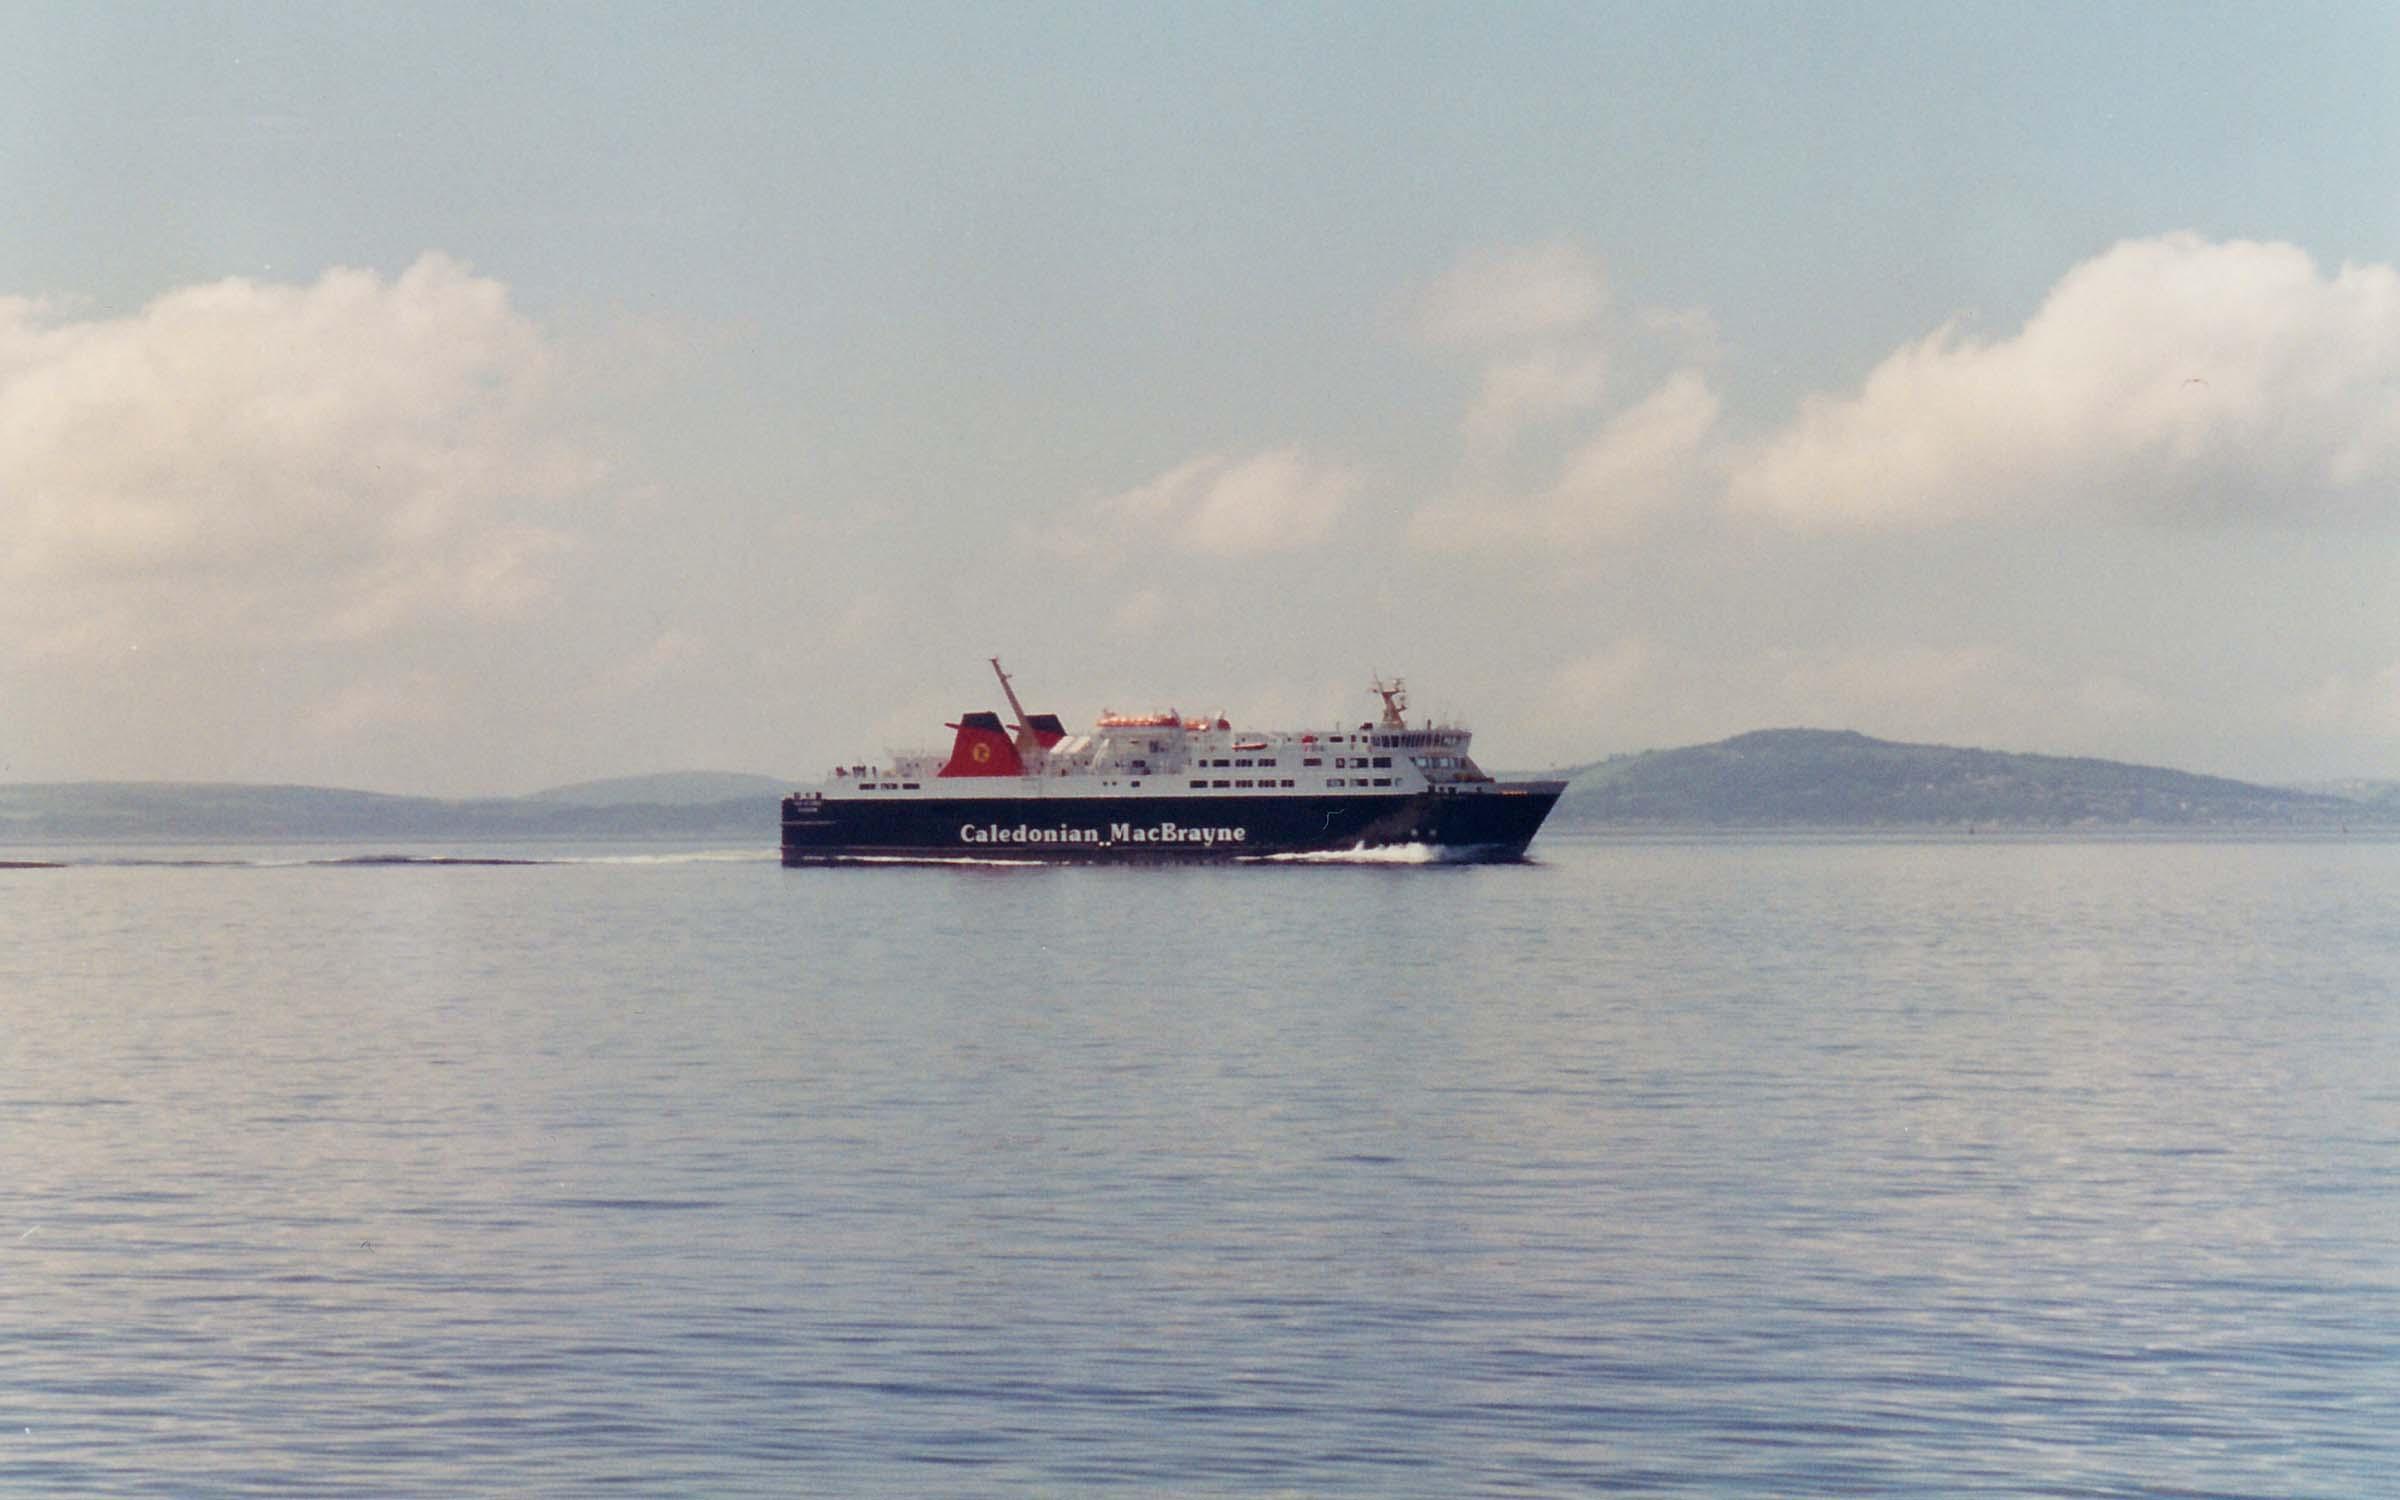 Isle of Lewis undergoin speed trials off Skelmorlie (Ships of CalMac)